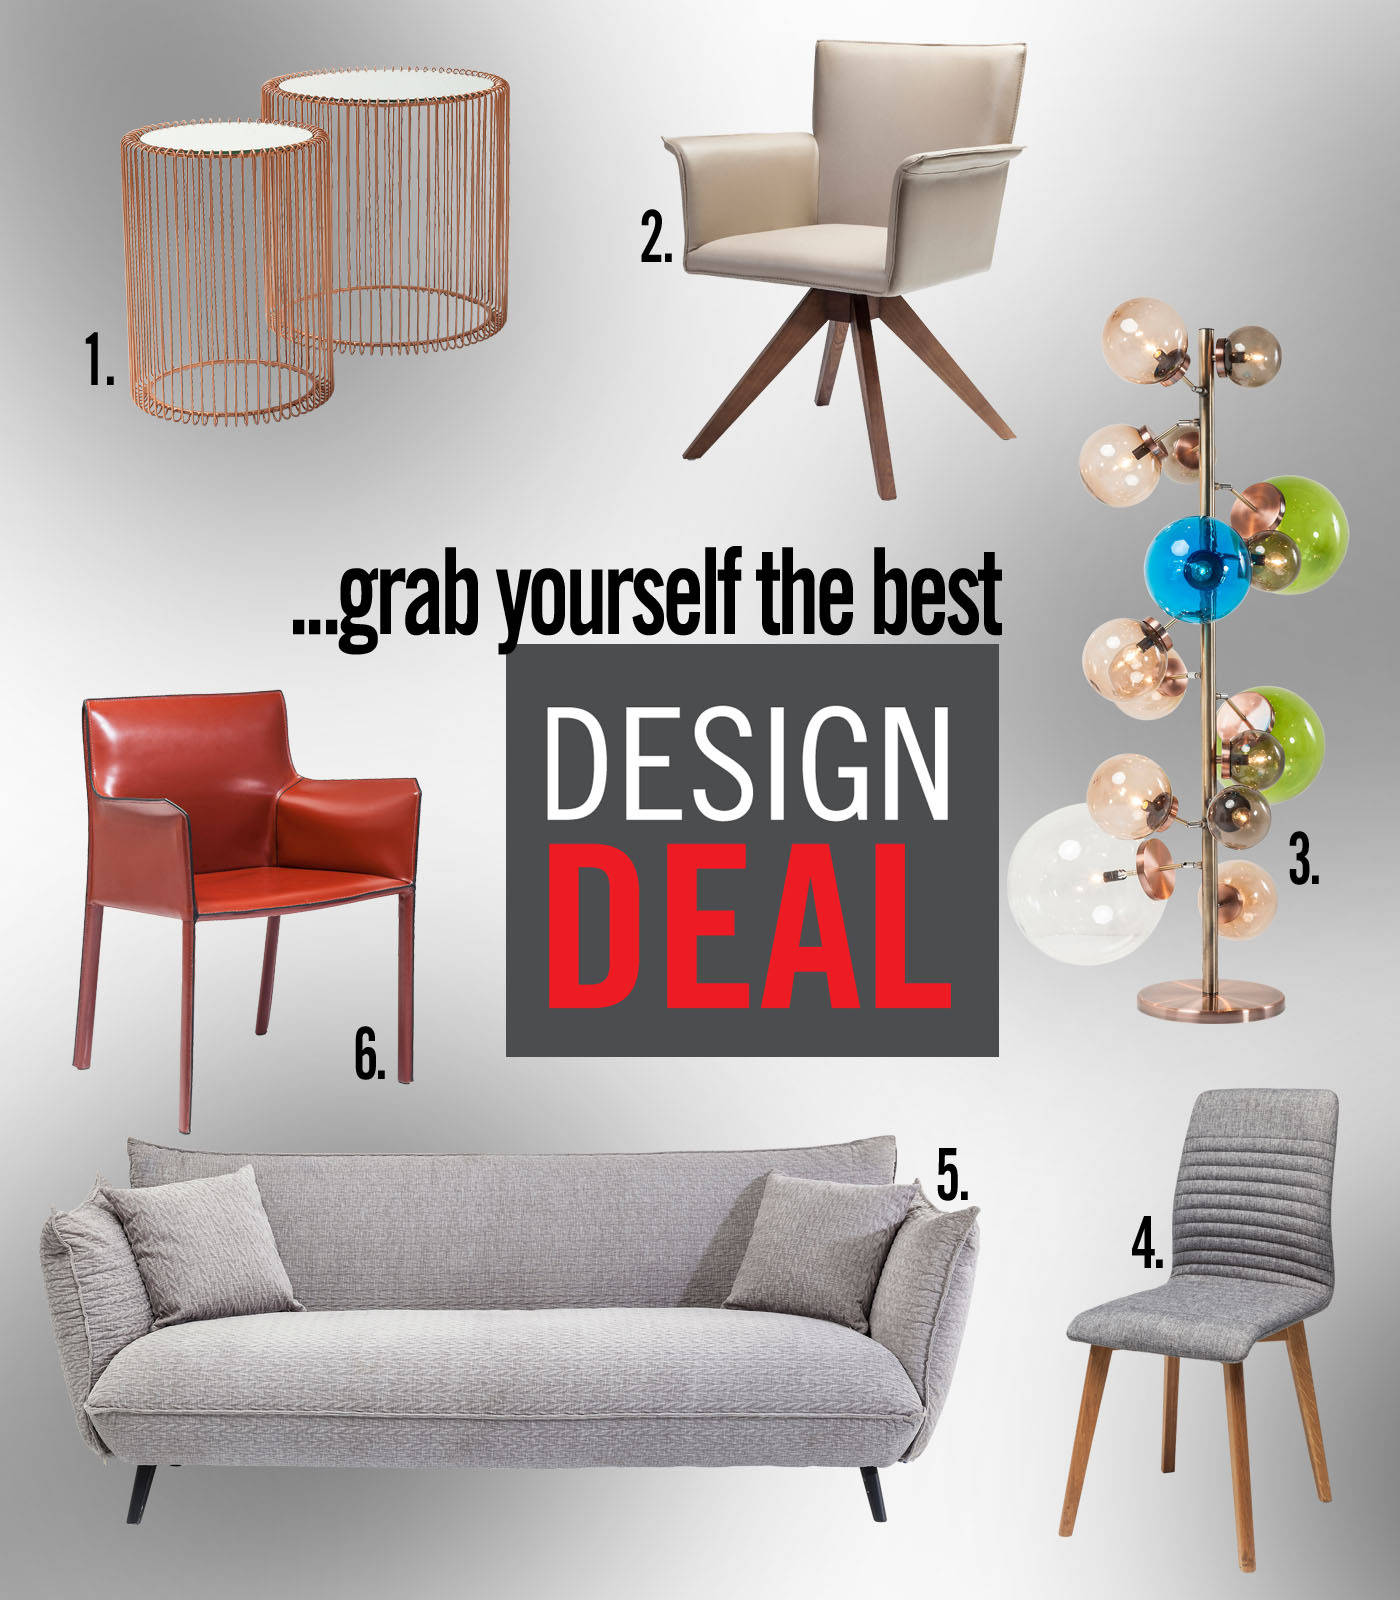 The Kare Design Deals